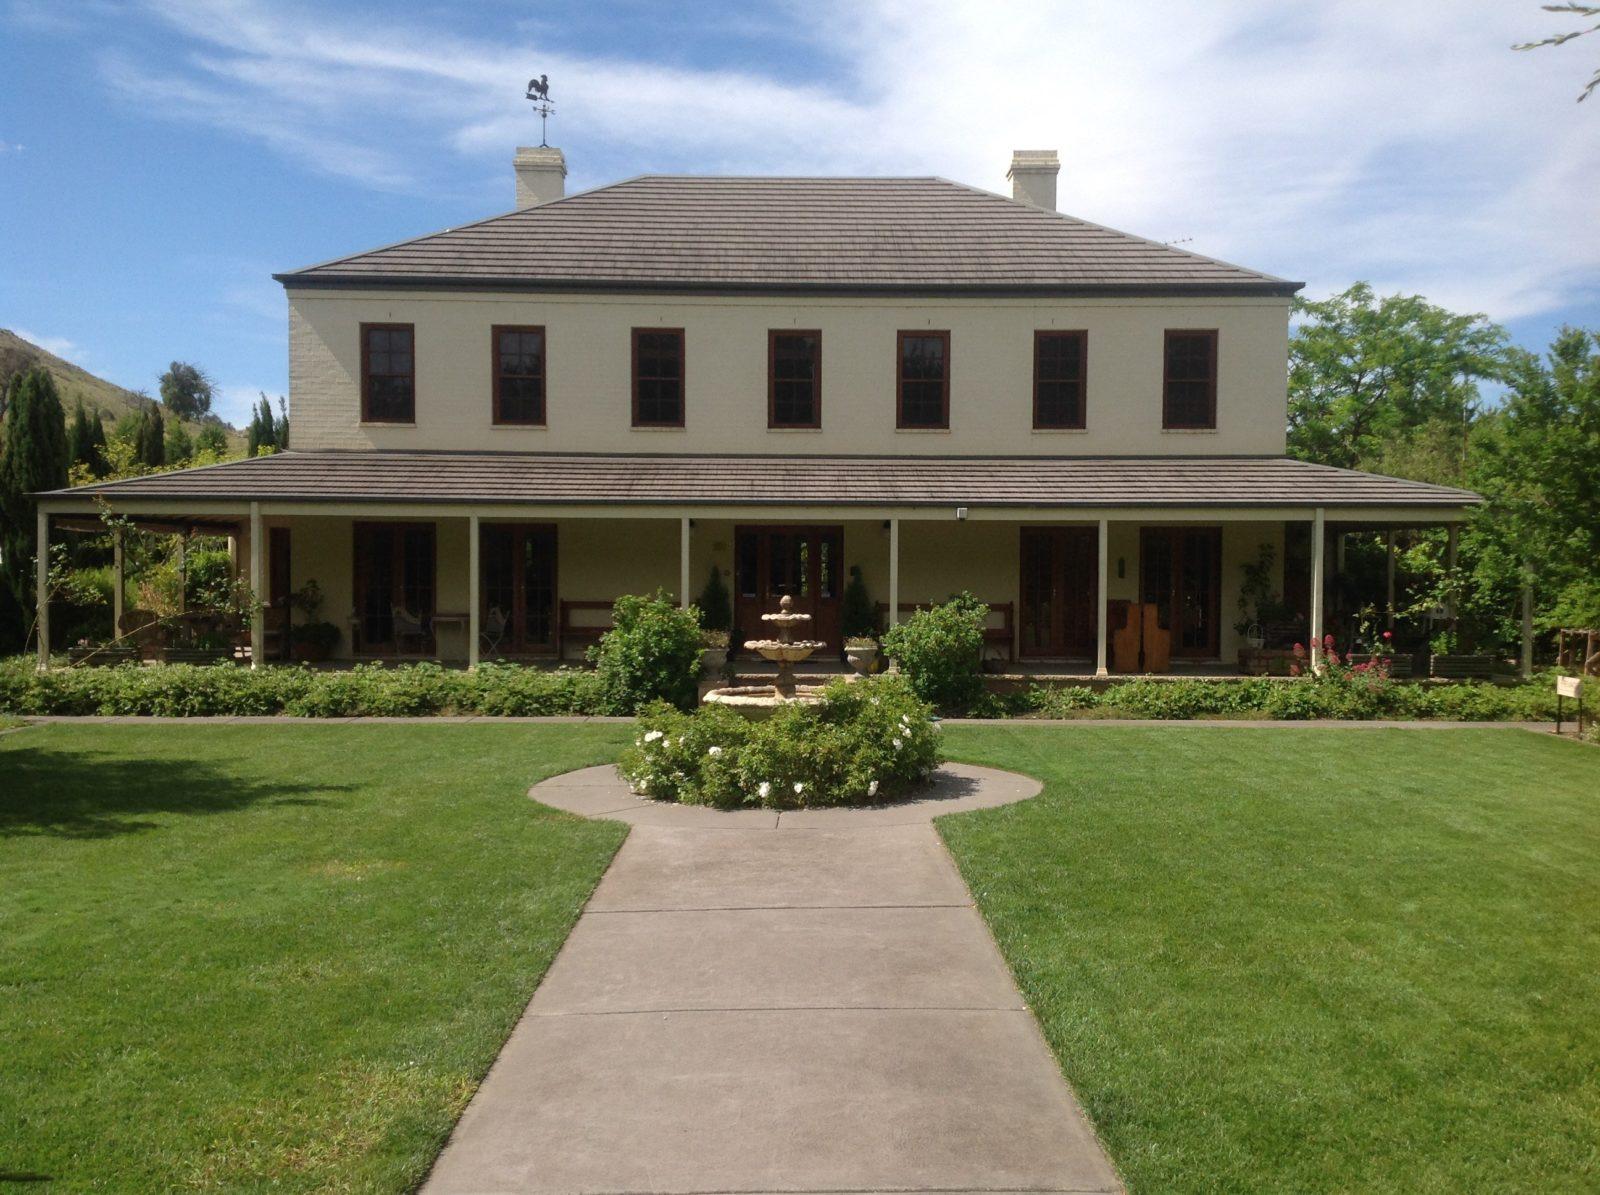 Ginninderry Homestead exterior